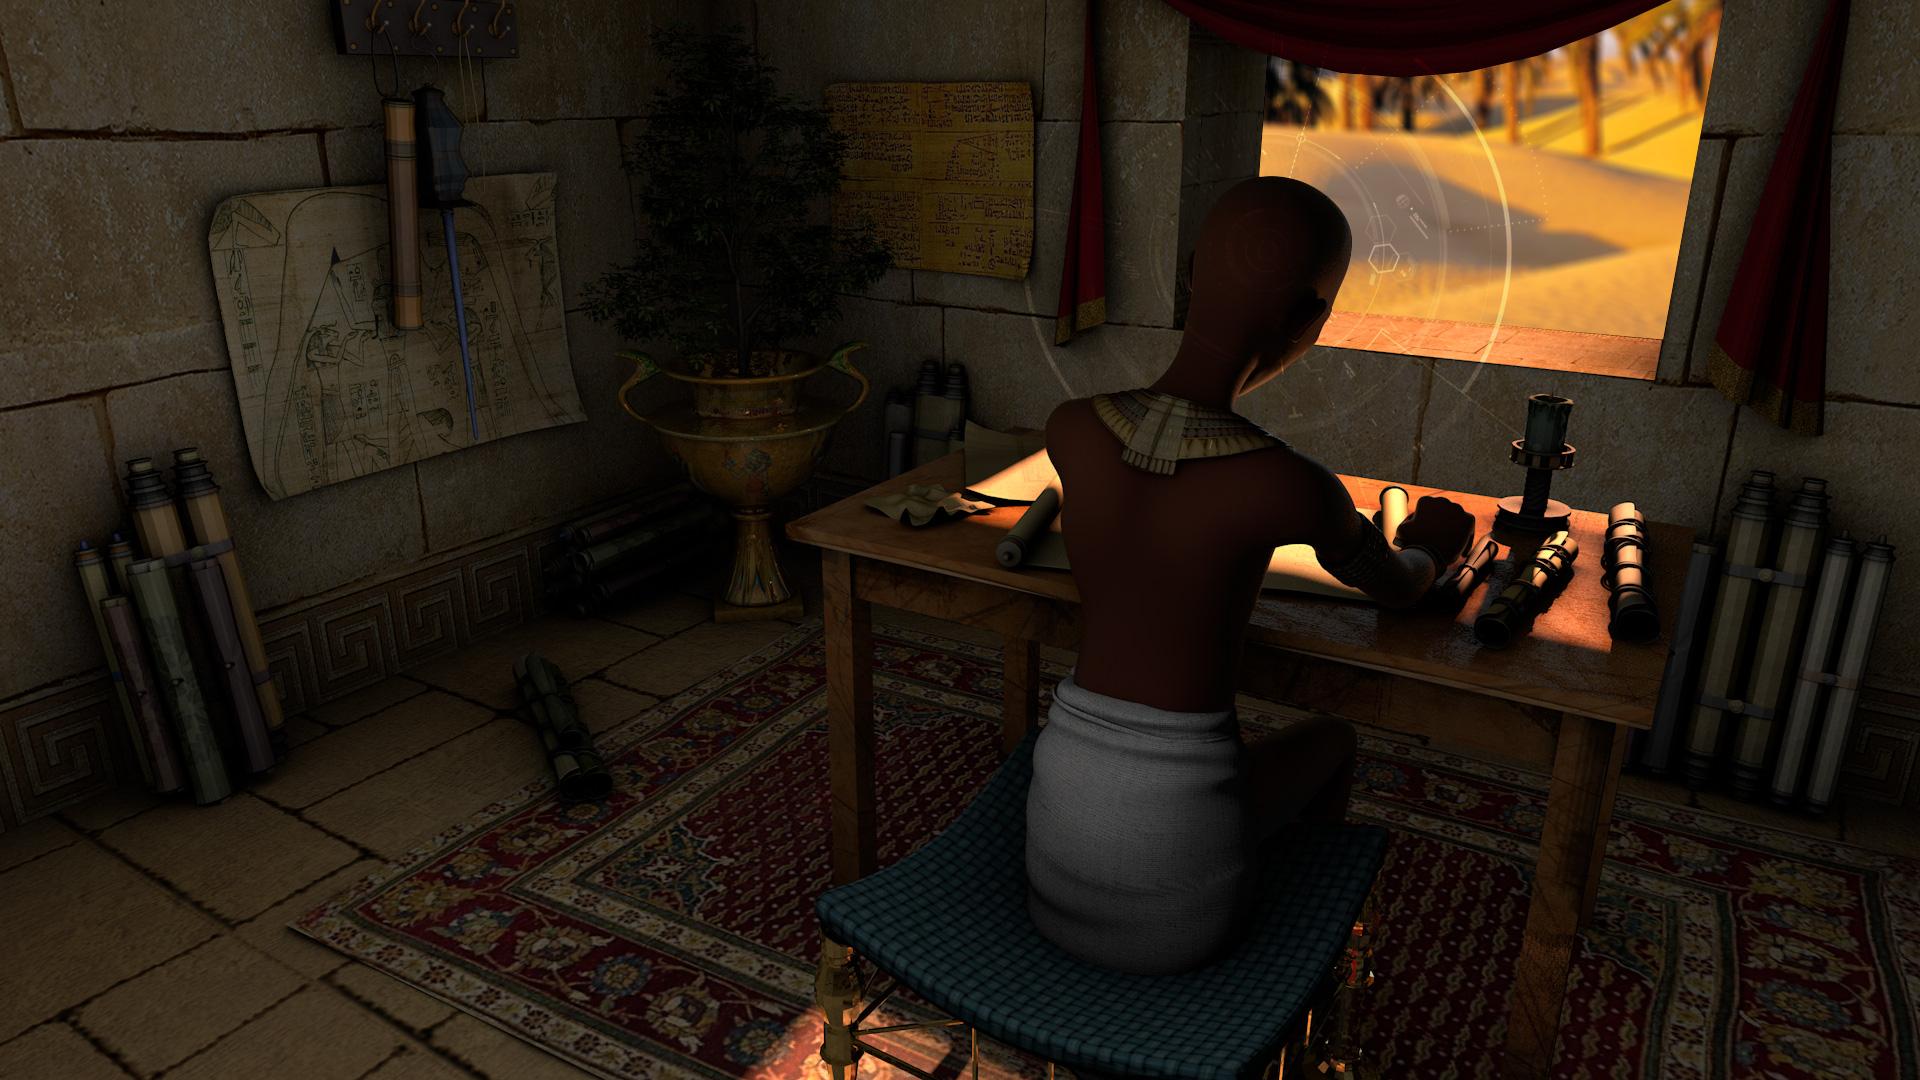 Imhotep_Room_V01.jpg